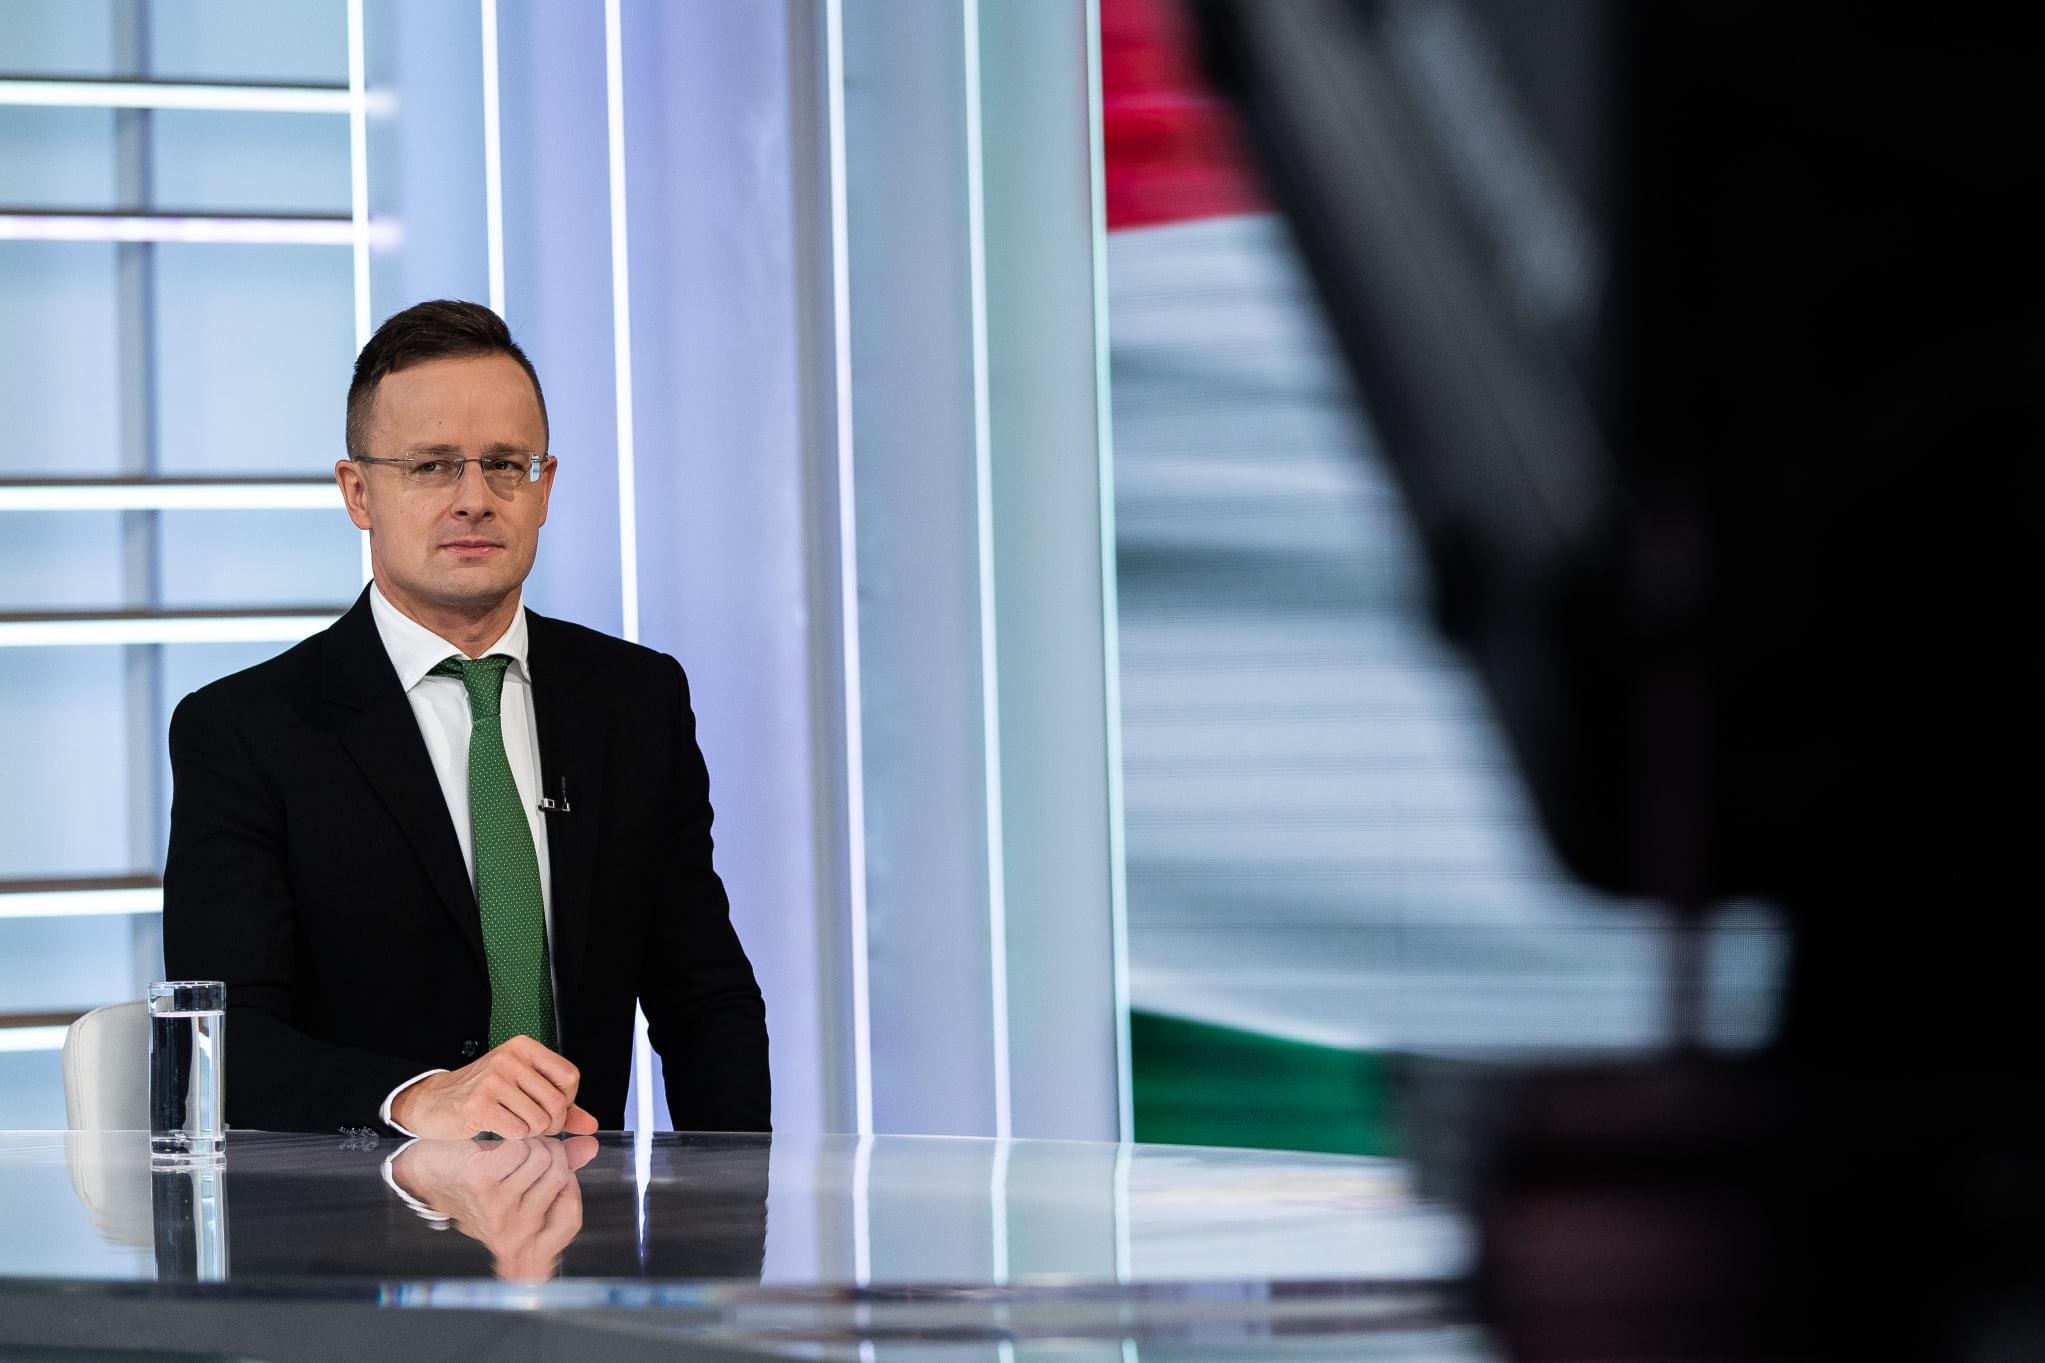 FM Szijjártó on Testing Positive: 'I don't wish this situation to anyone'